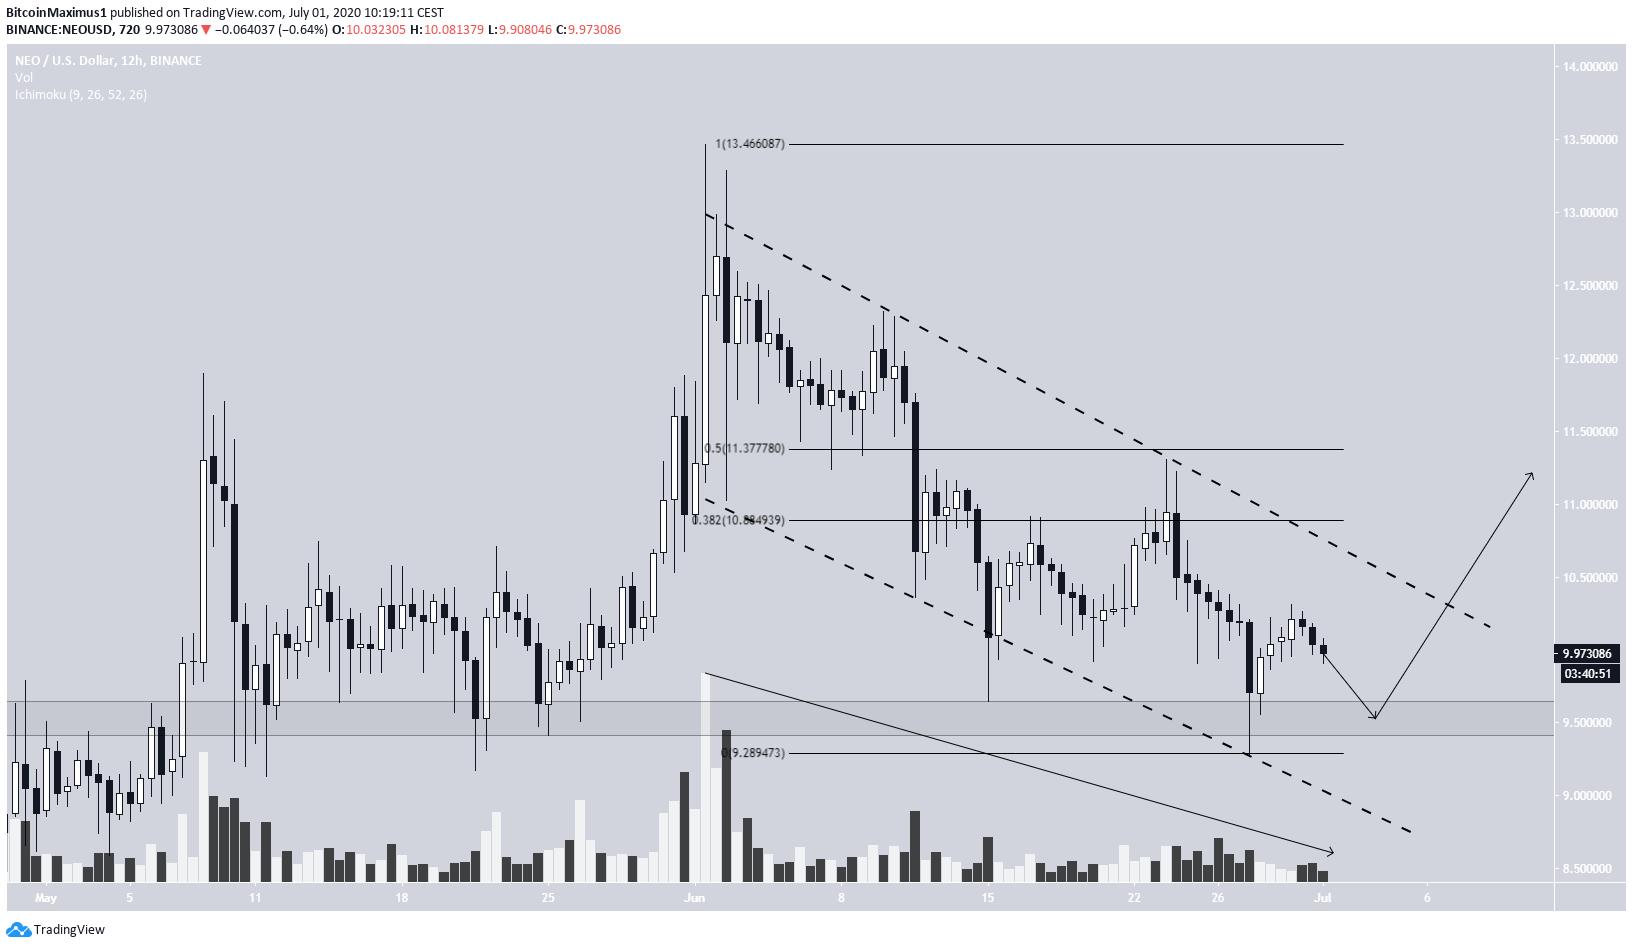 NEO Short-Term Price Movement